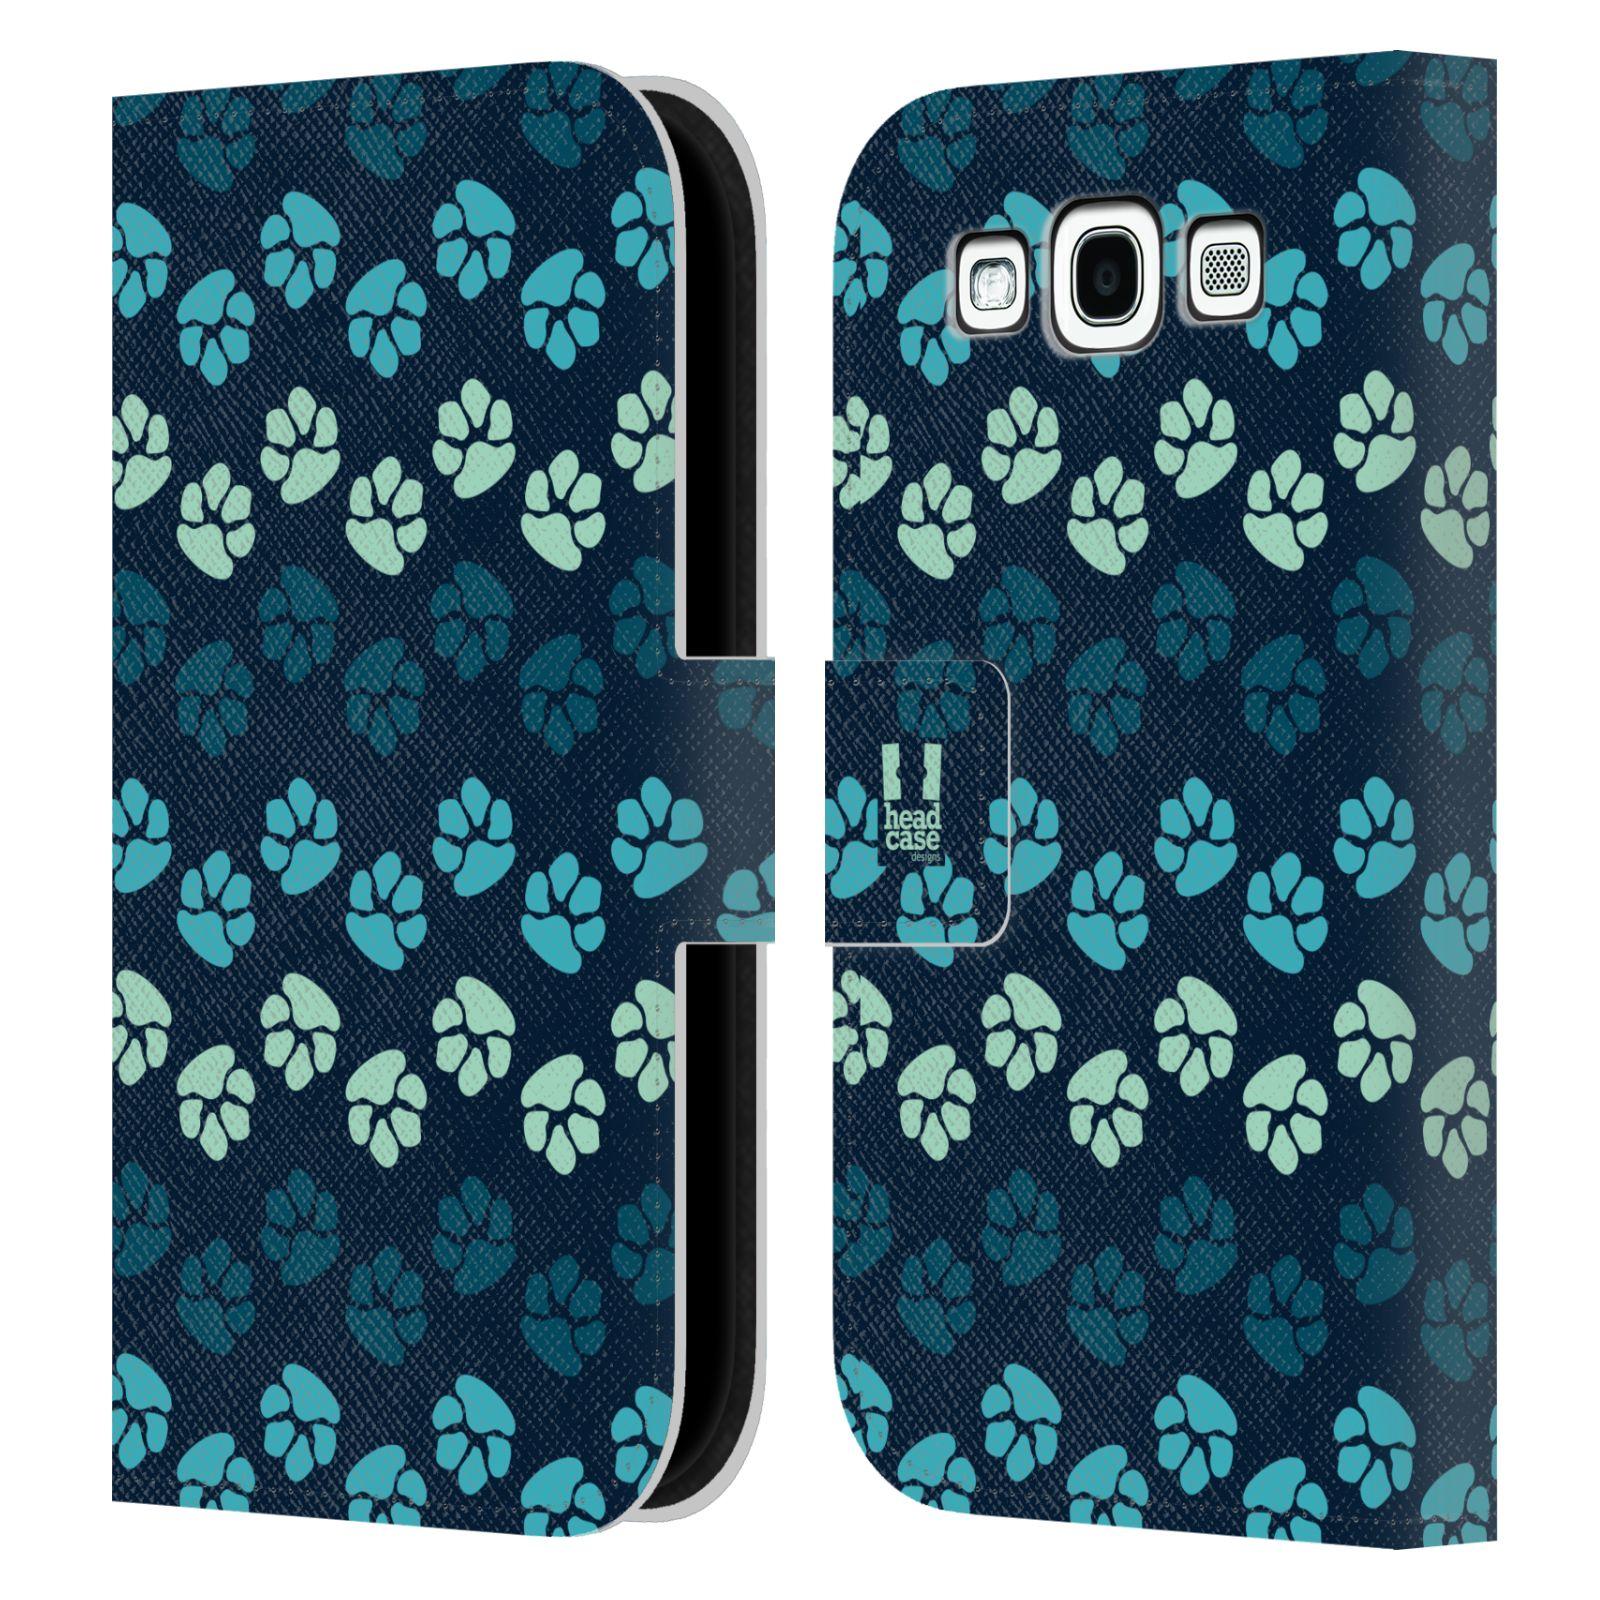 HEAD CASE Flipové pouzdro pro mobil Samsung Galaxy S3 Pejsek ťapky modrá barva